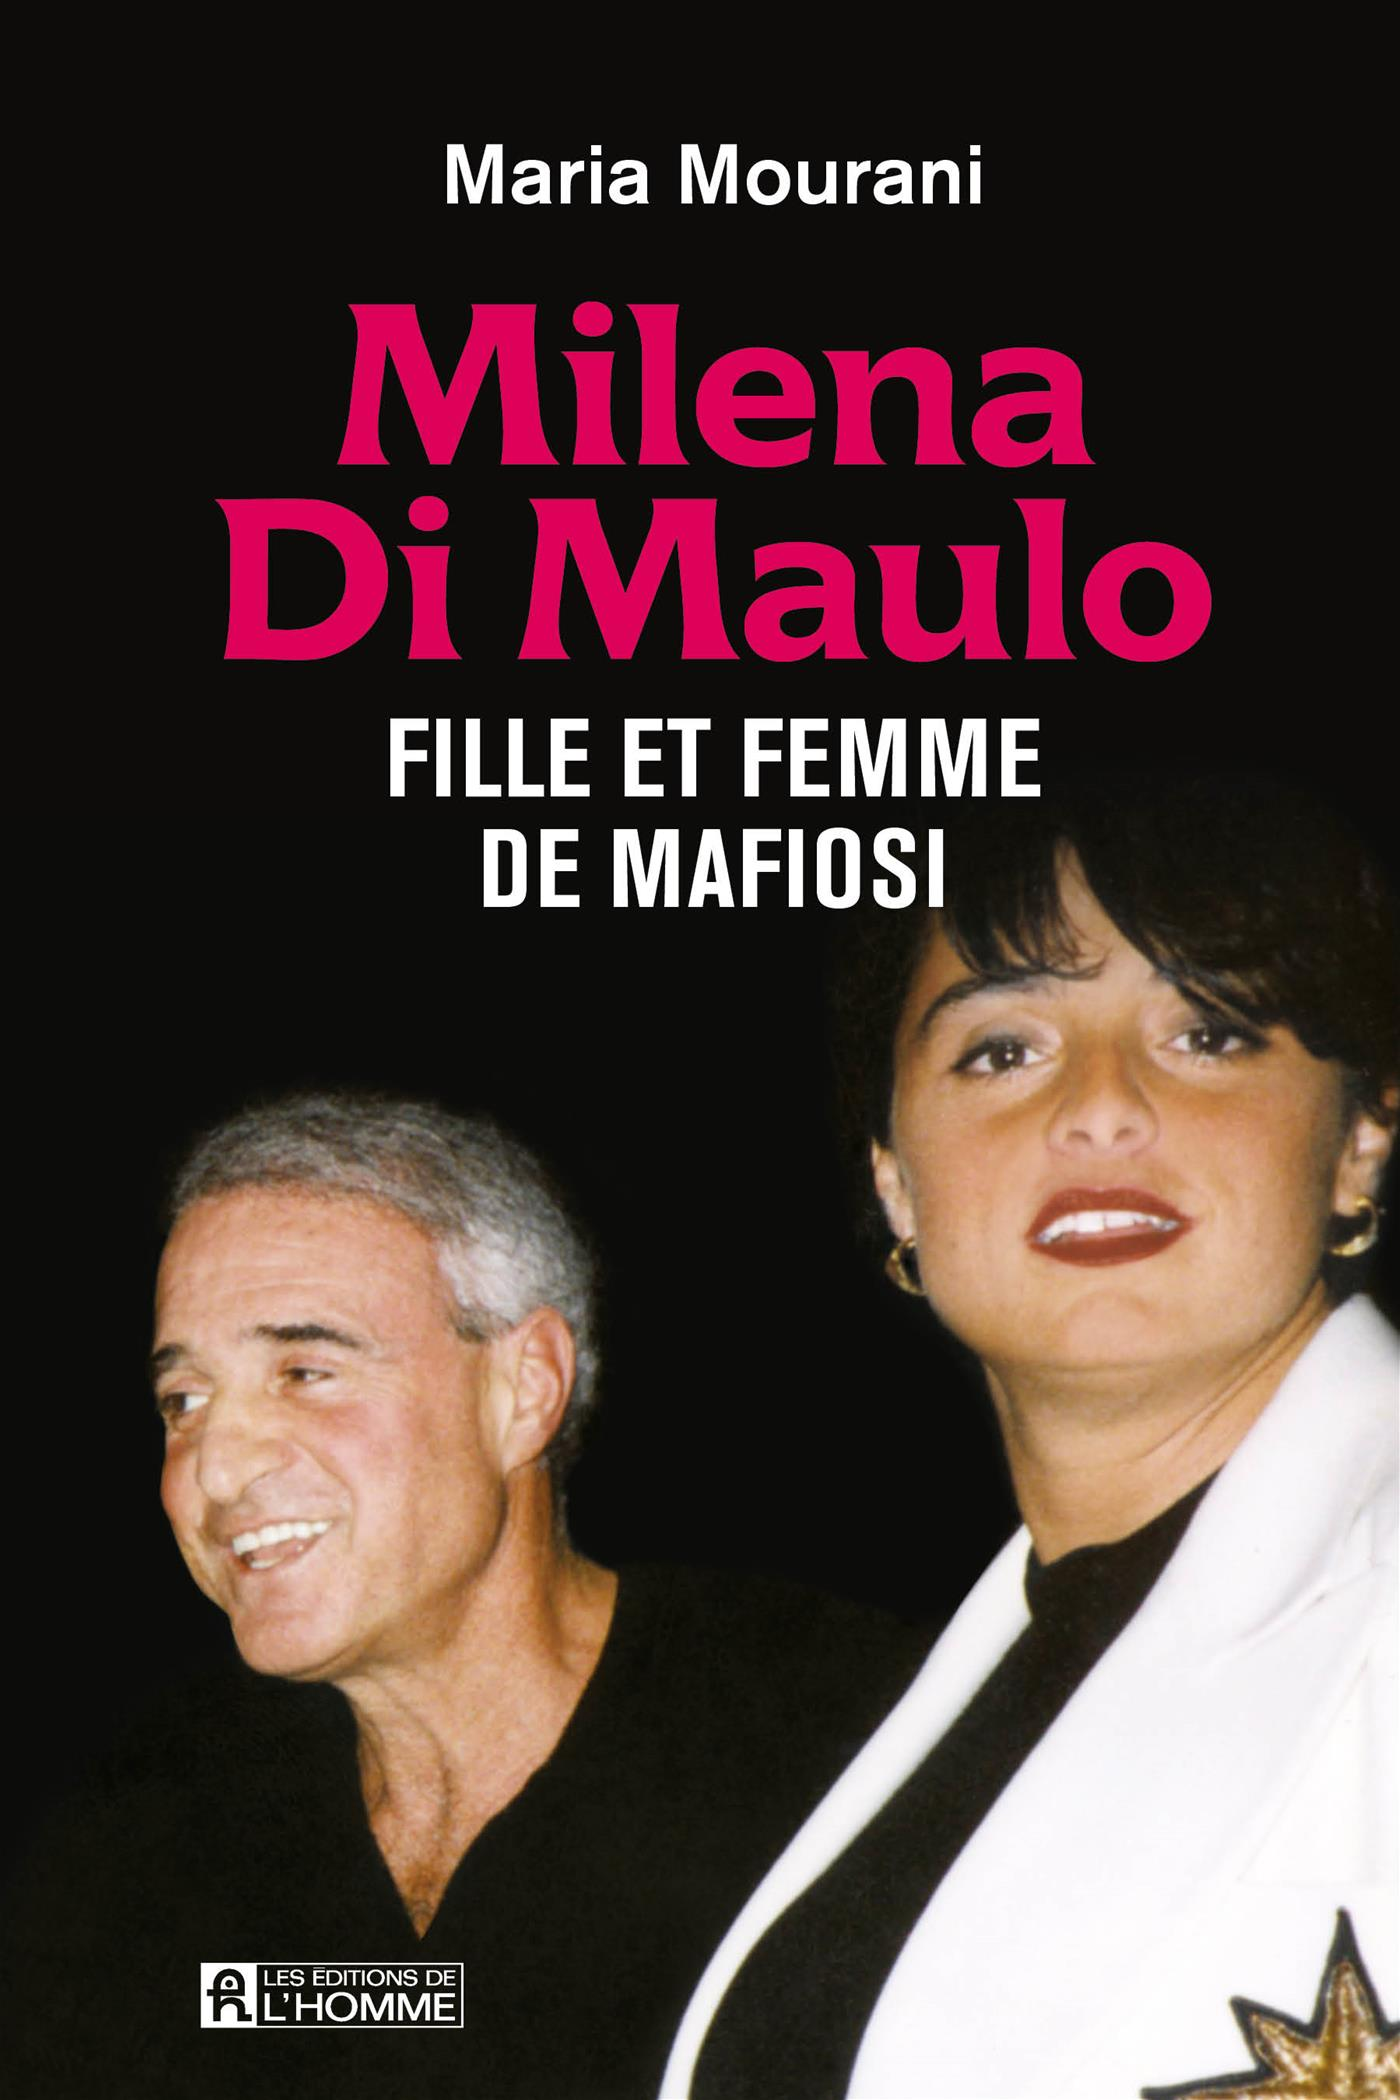 Milena Di Maulo - Fille et femme de mafiosi